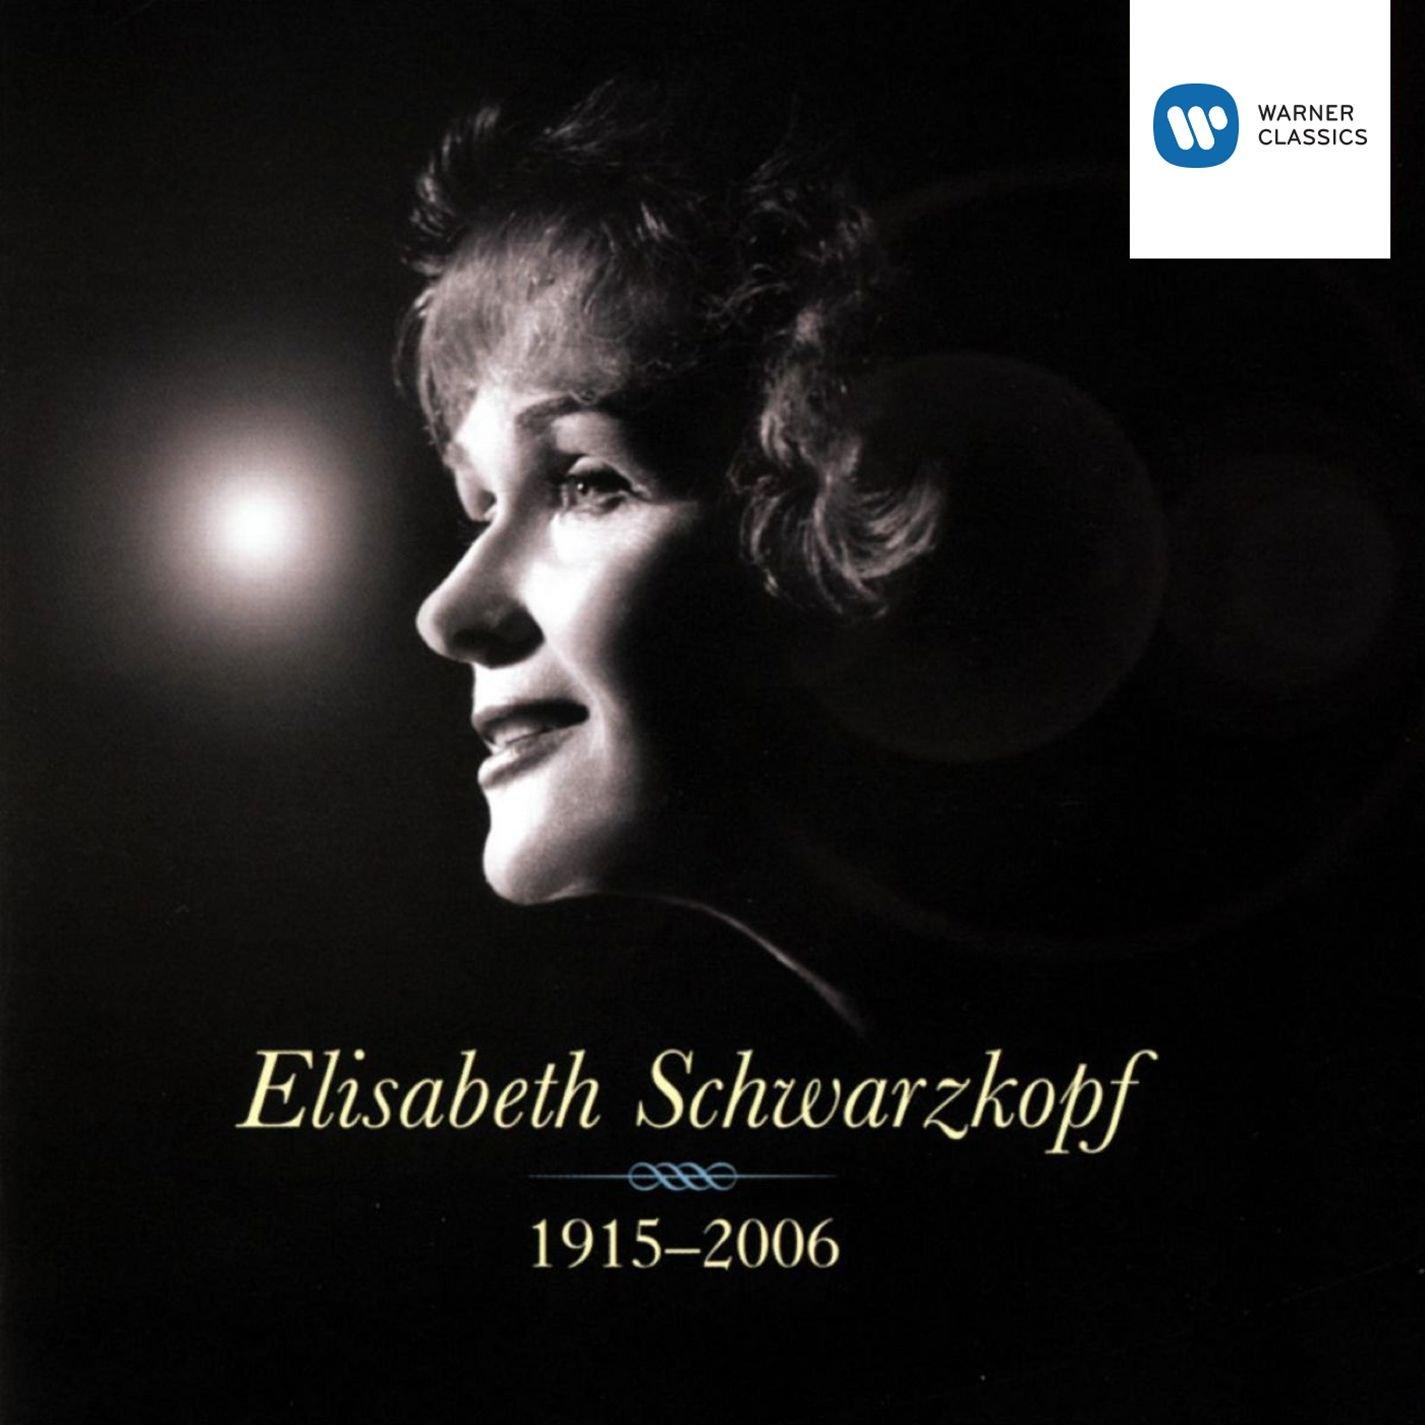 Elisabeth Schwarzkopf: 1915-2006 by Warner Classics / EMI Classics